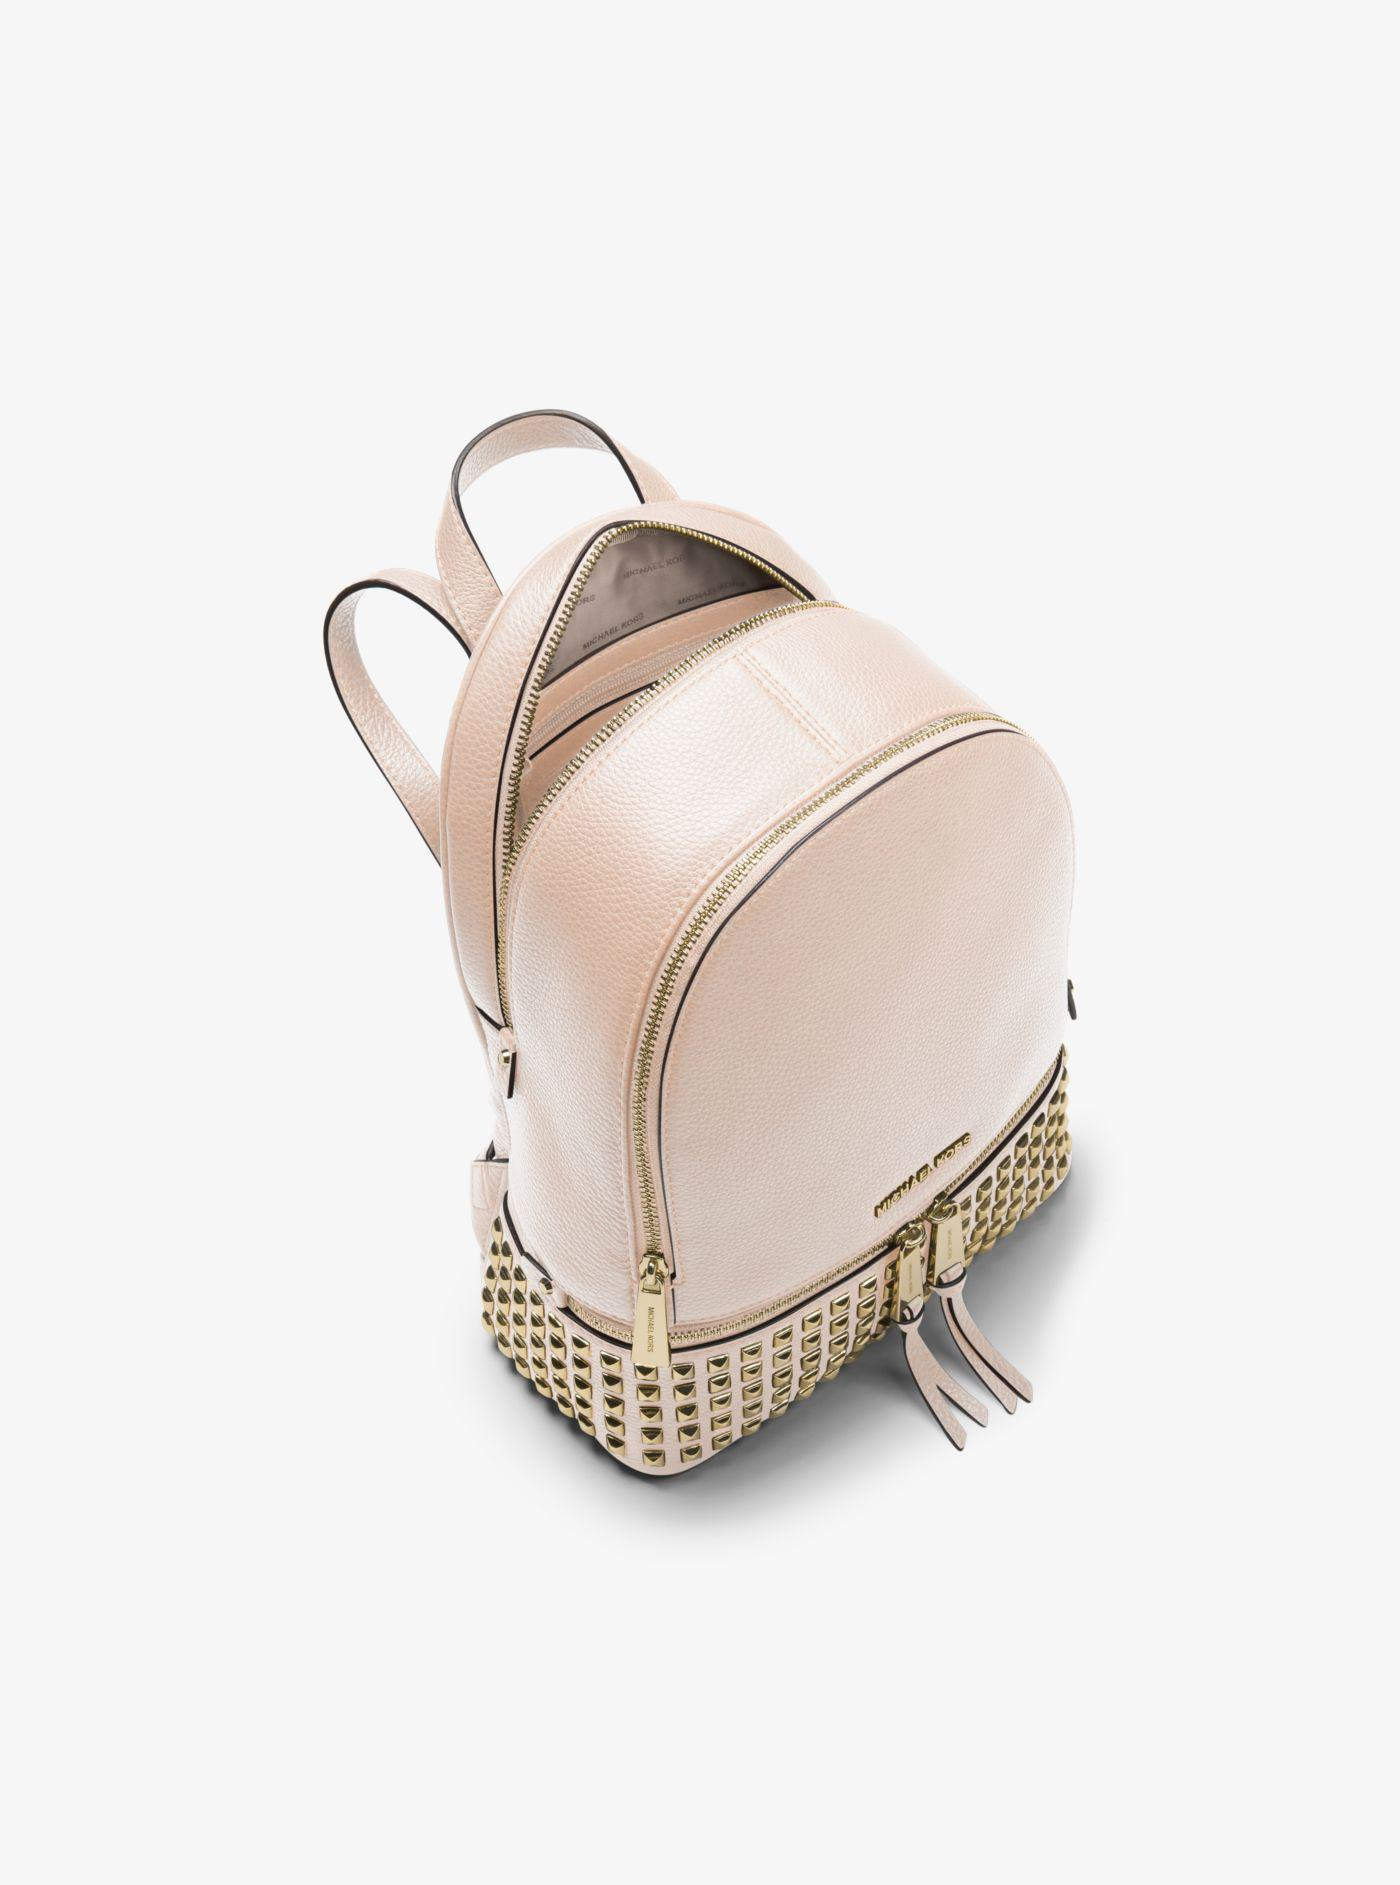 ad1b0d48fc19 ... where to buy michael kors pink rhea medium studded leather backpack  lyst. view fullscreen 19395